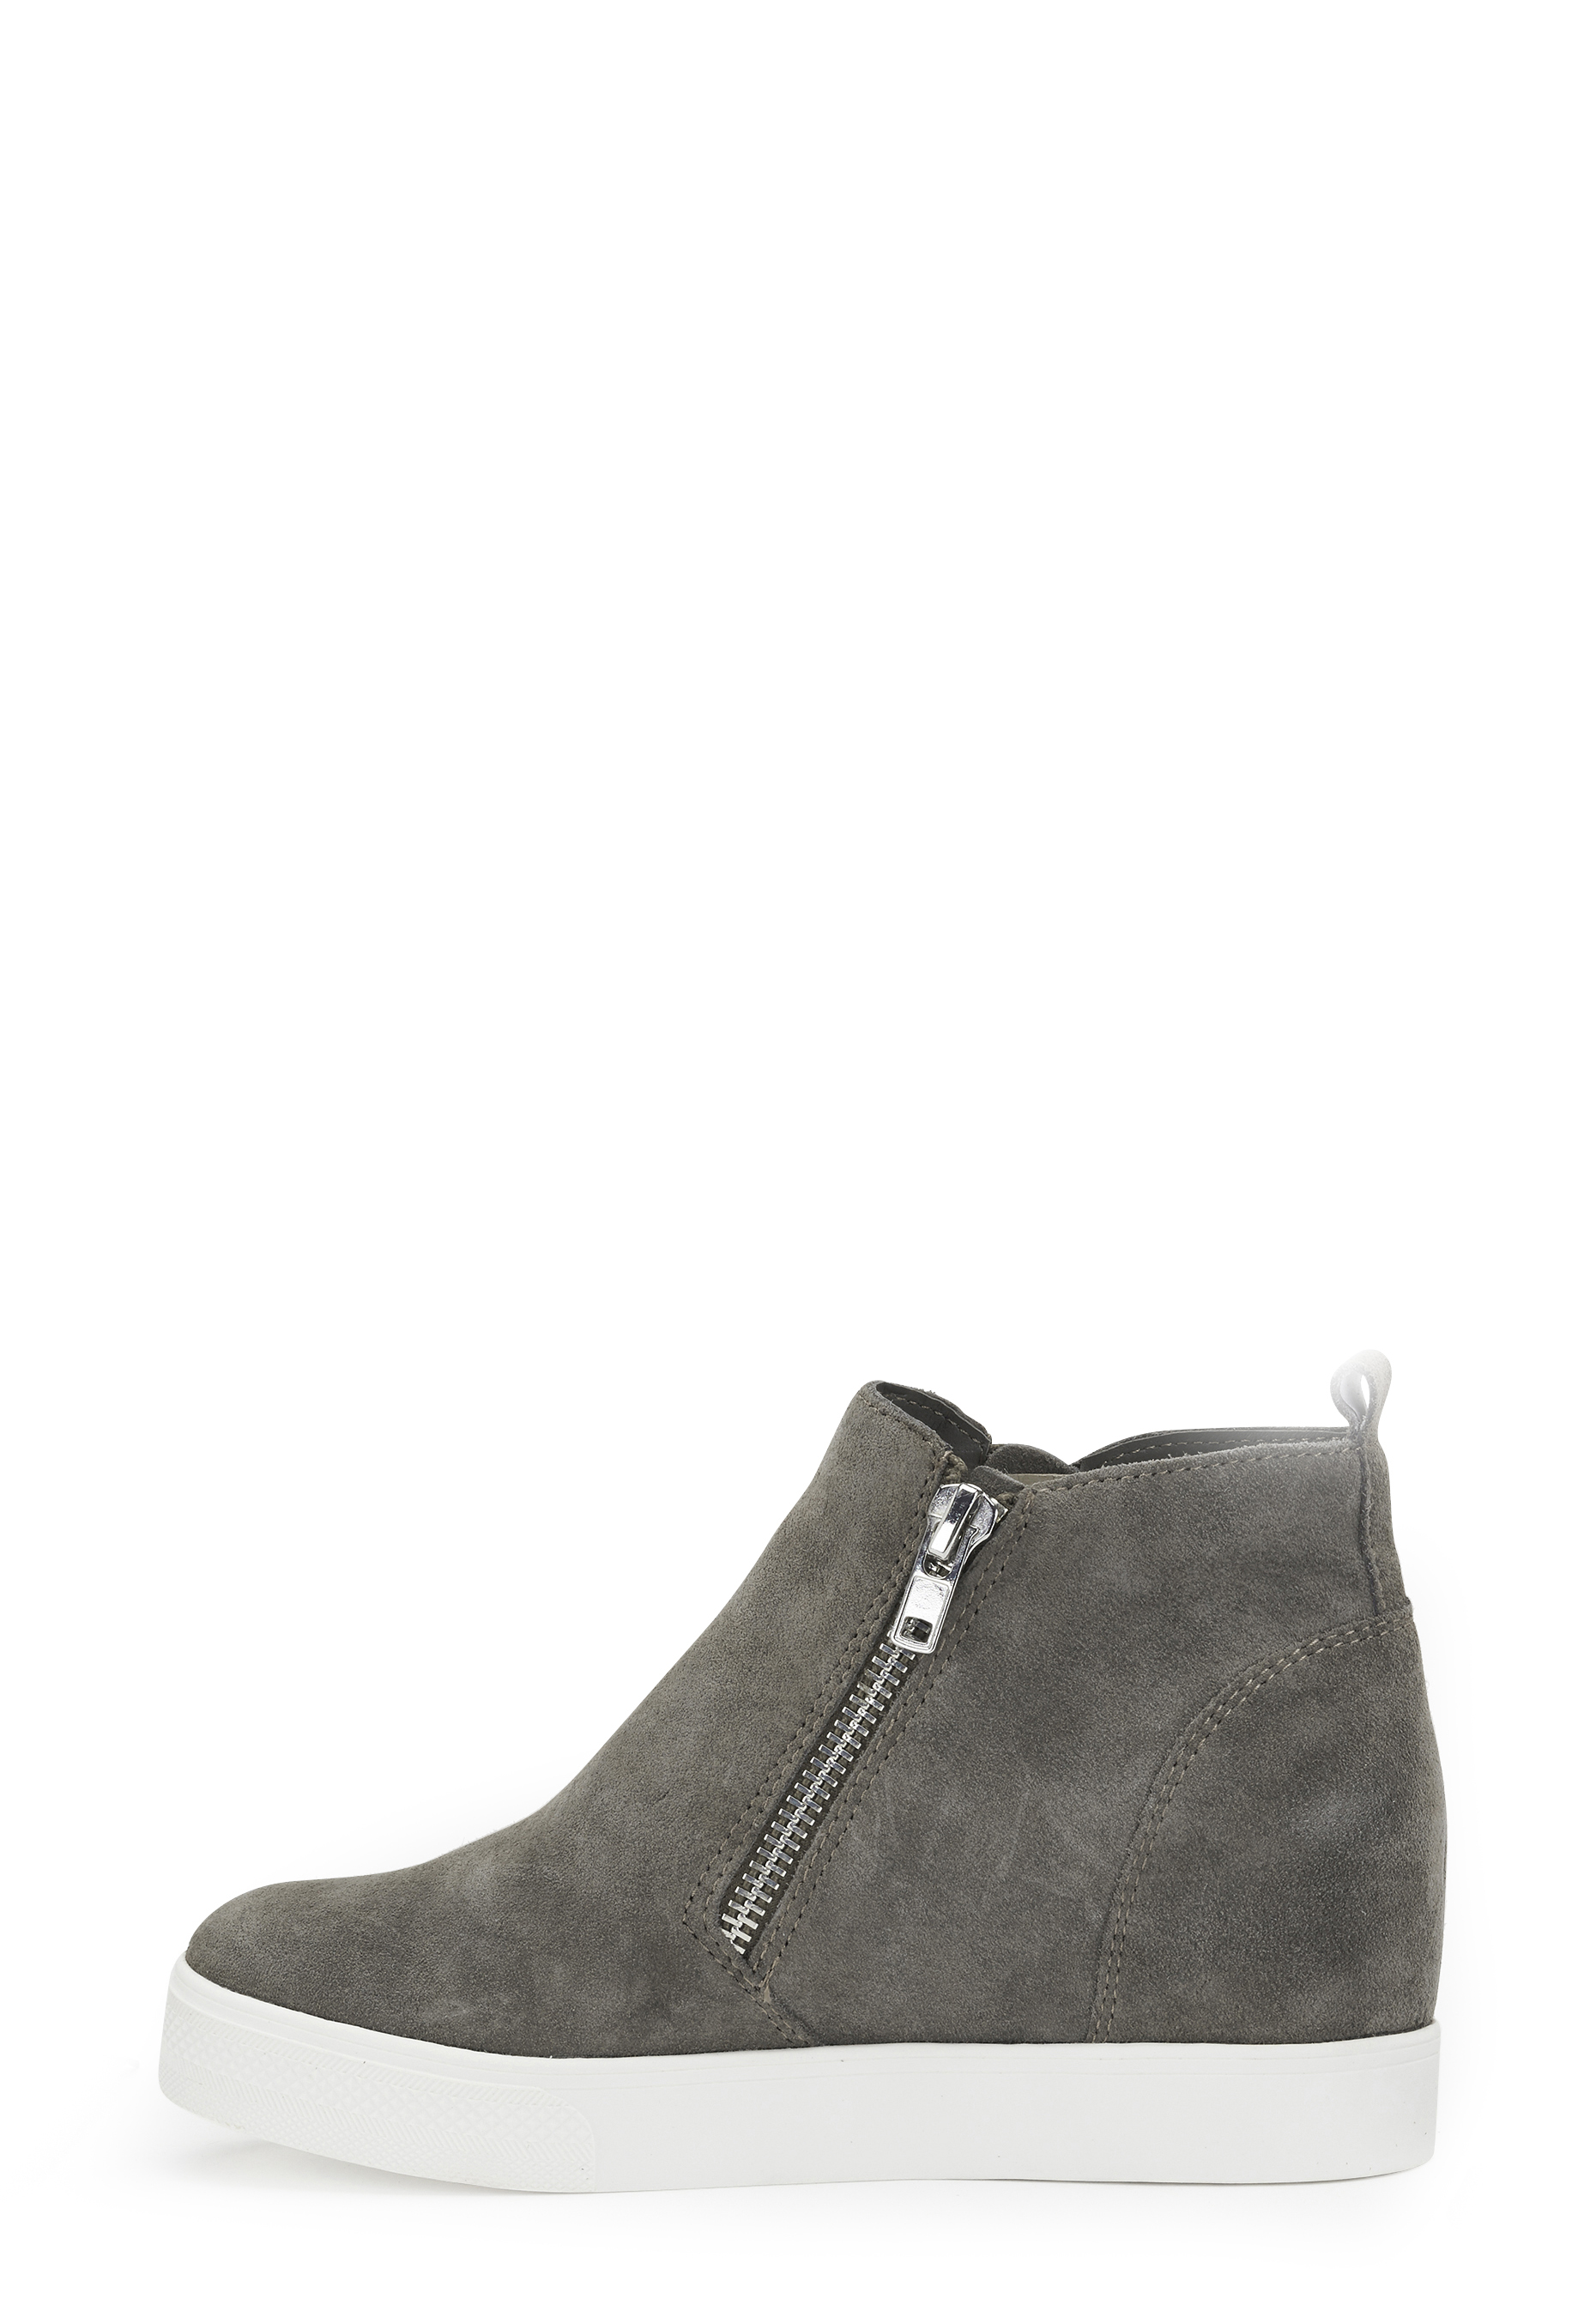 3fed41ef5d2 Steve Madden Wedgie Sneaker Shoes Grey Suede - Bubbleroom